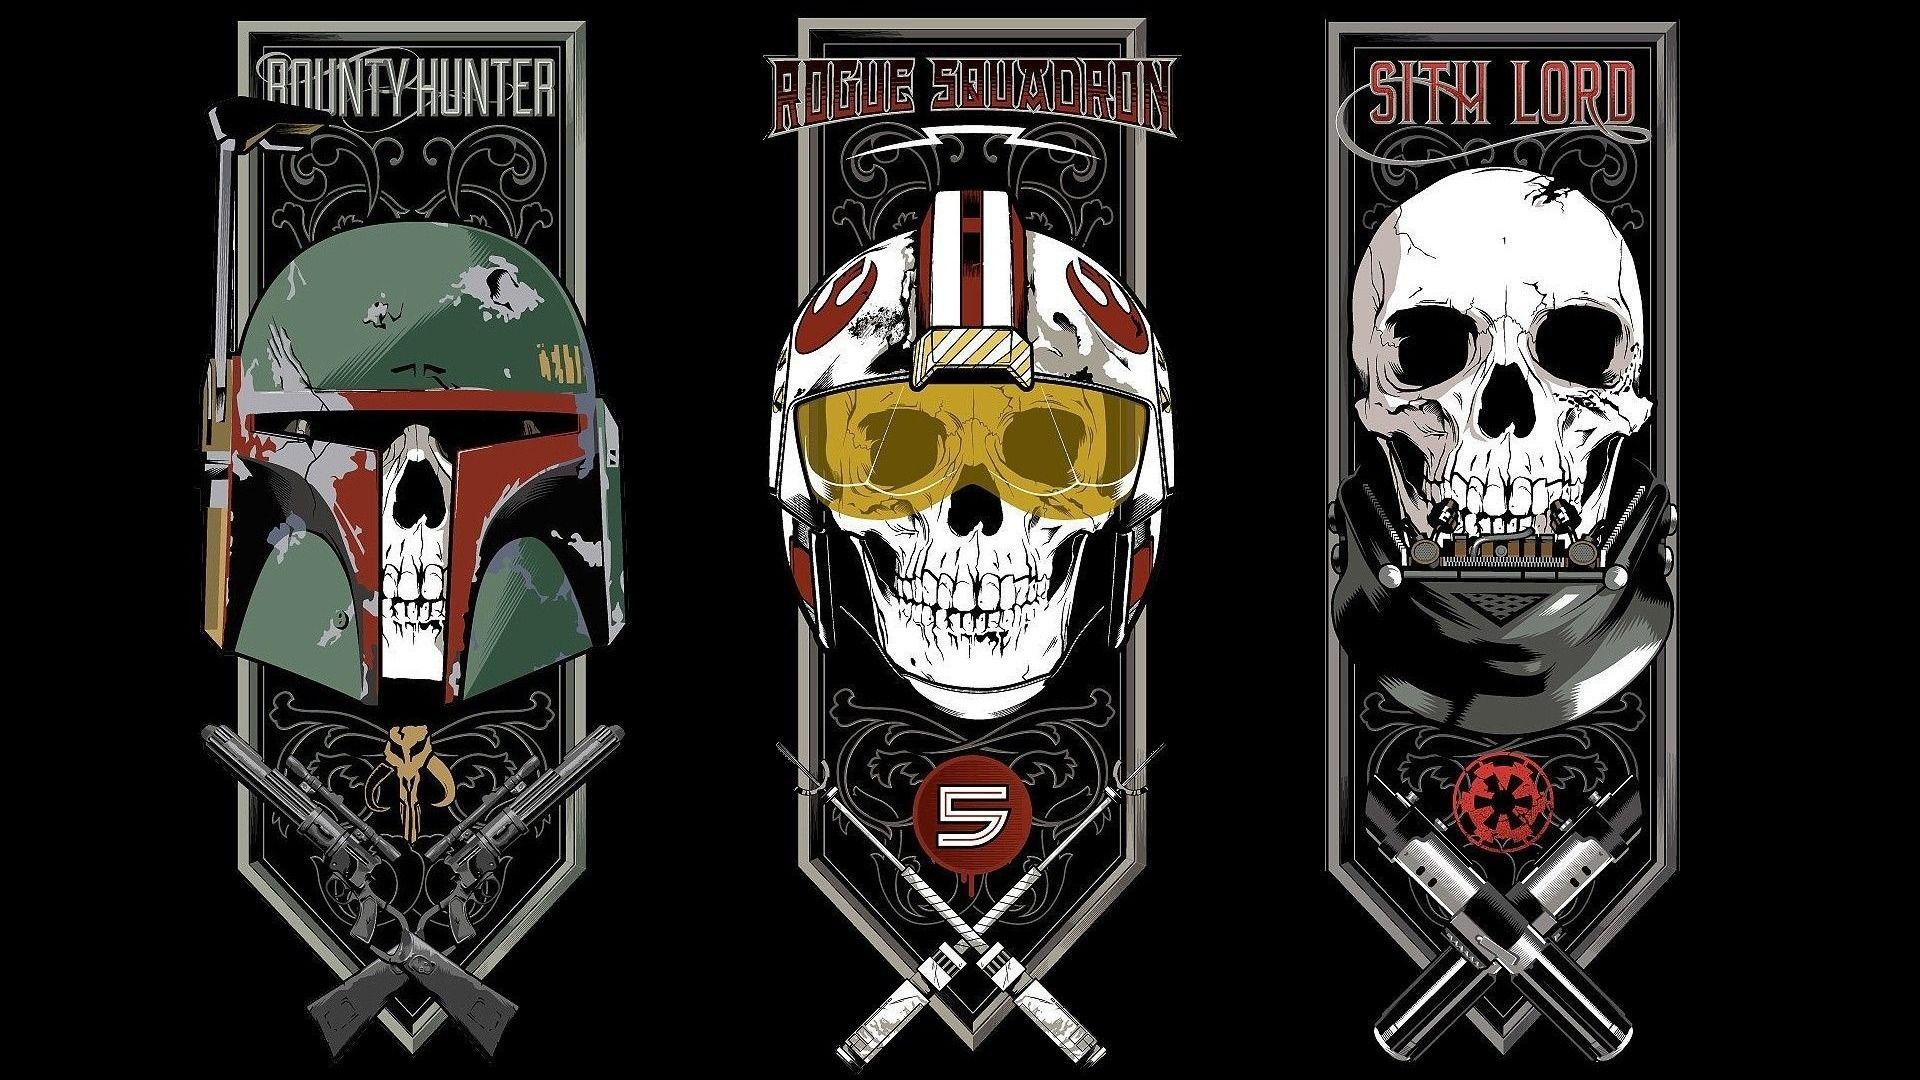 Download Wallpaper Star Wars Sake Gun Darth Vader Sith Lord Weapon Rifle Revolver Bones Pilot Pearls Bounty Hunter Rogue Squadron